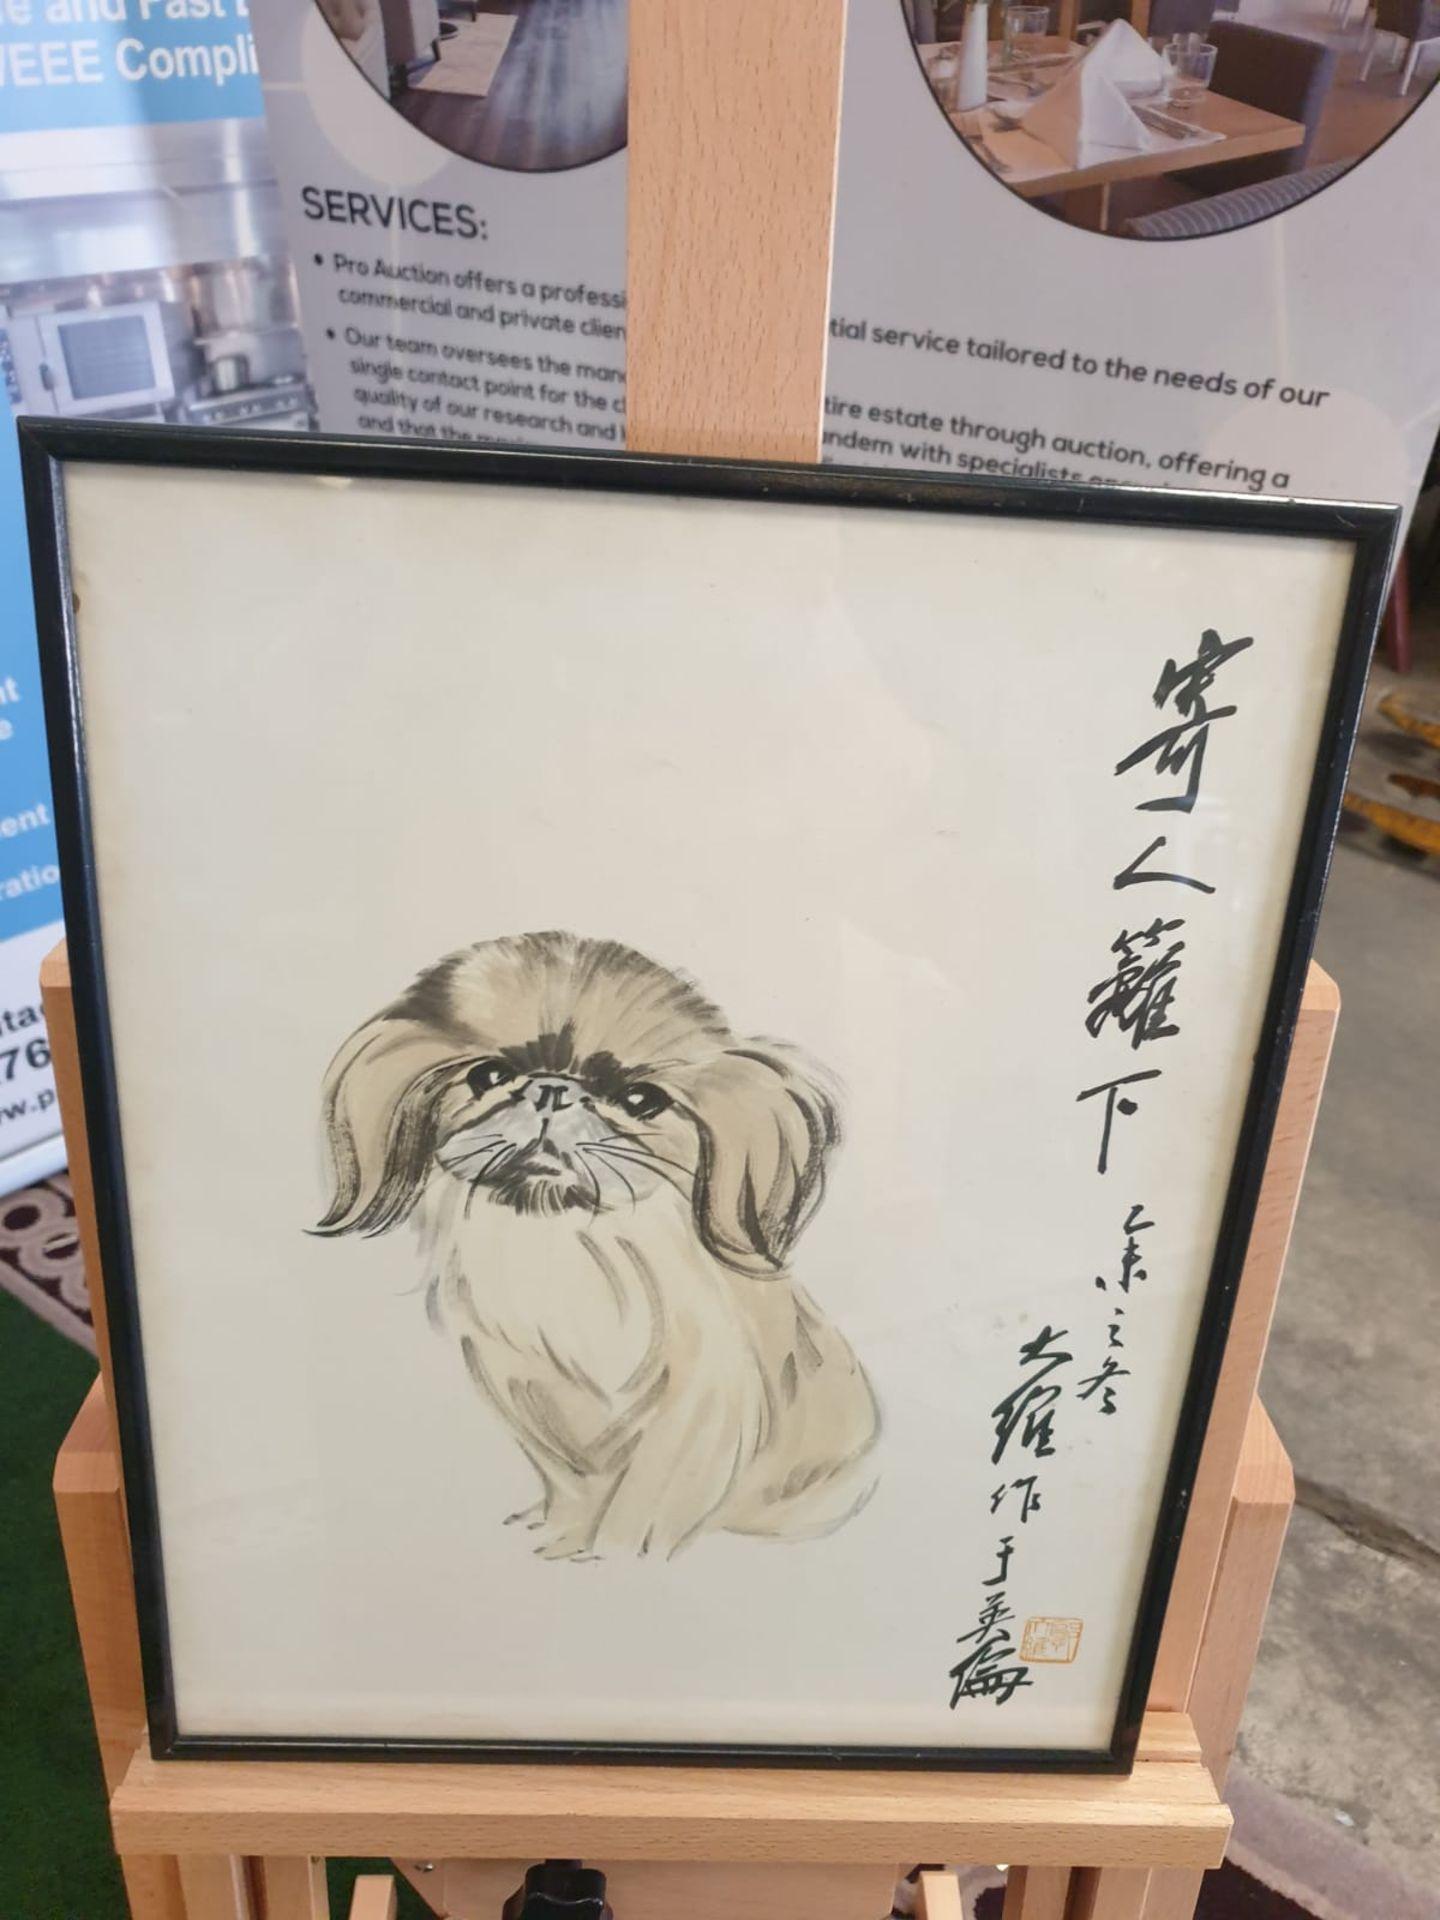 David Kwo Da-Wei (1919-2003) Chinese Lithographic Print Pup Da Wei Kwo, David Kwo 1919-2003 (Dawei - Image 3 of 3